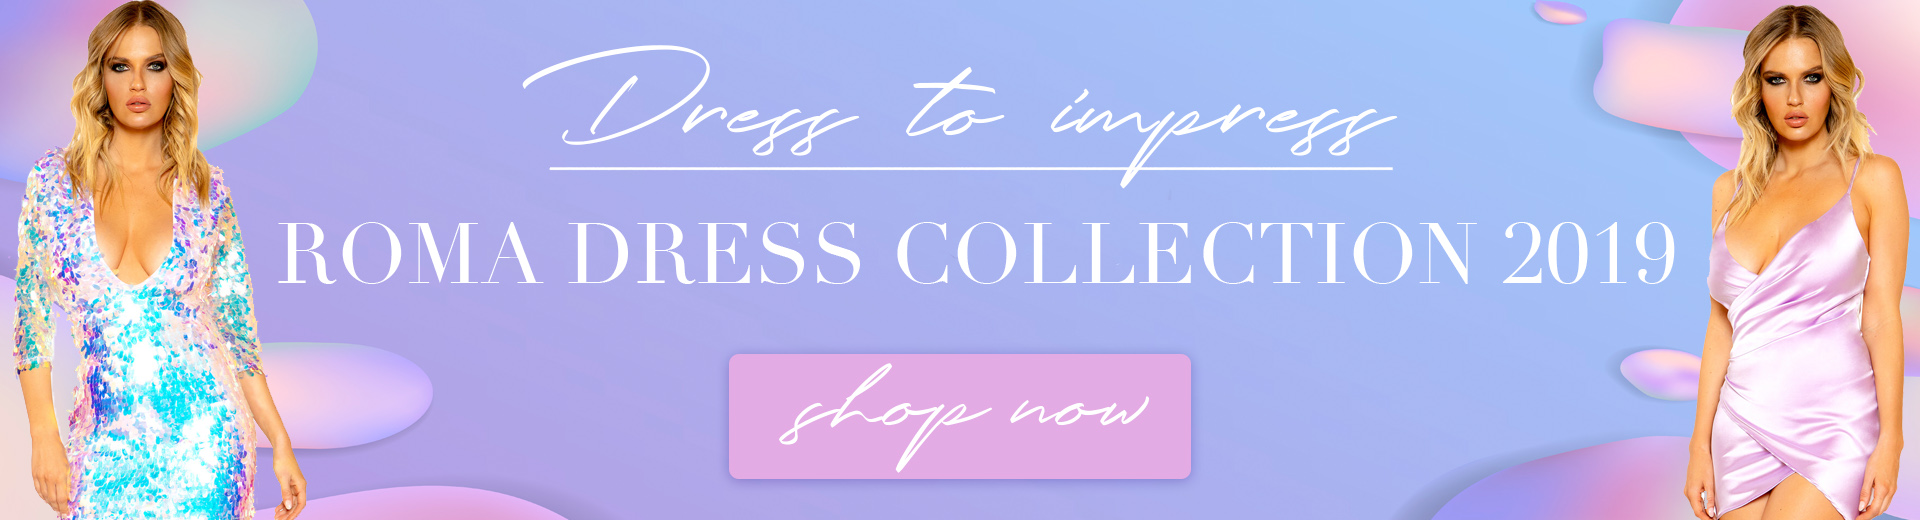 new roma dress collection MyStripperCloset.com